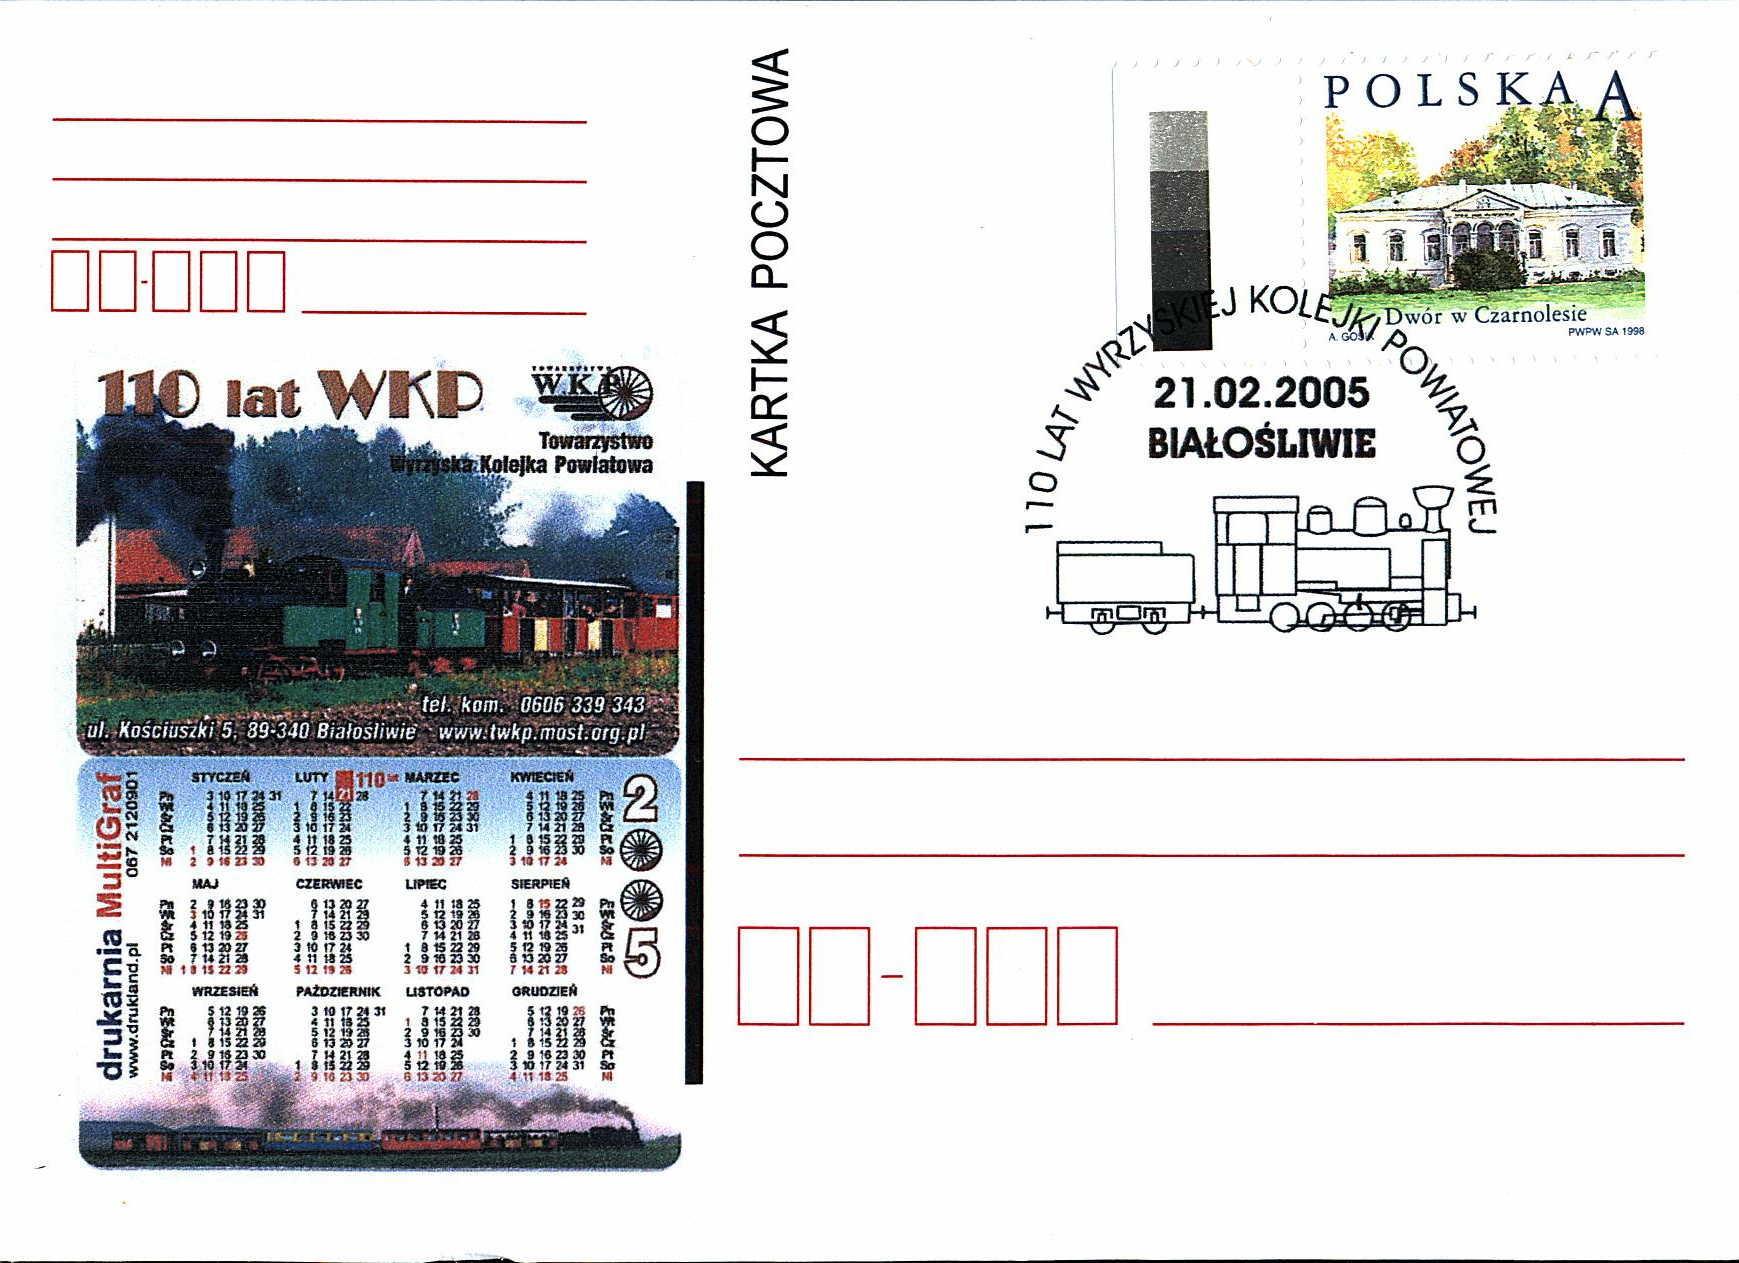 110 lat WKP